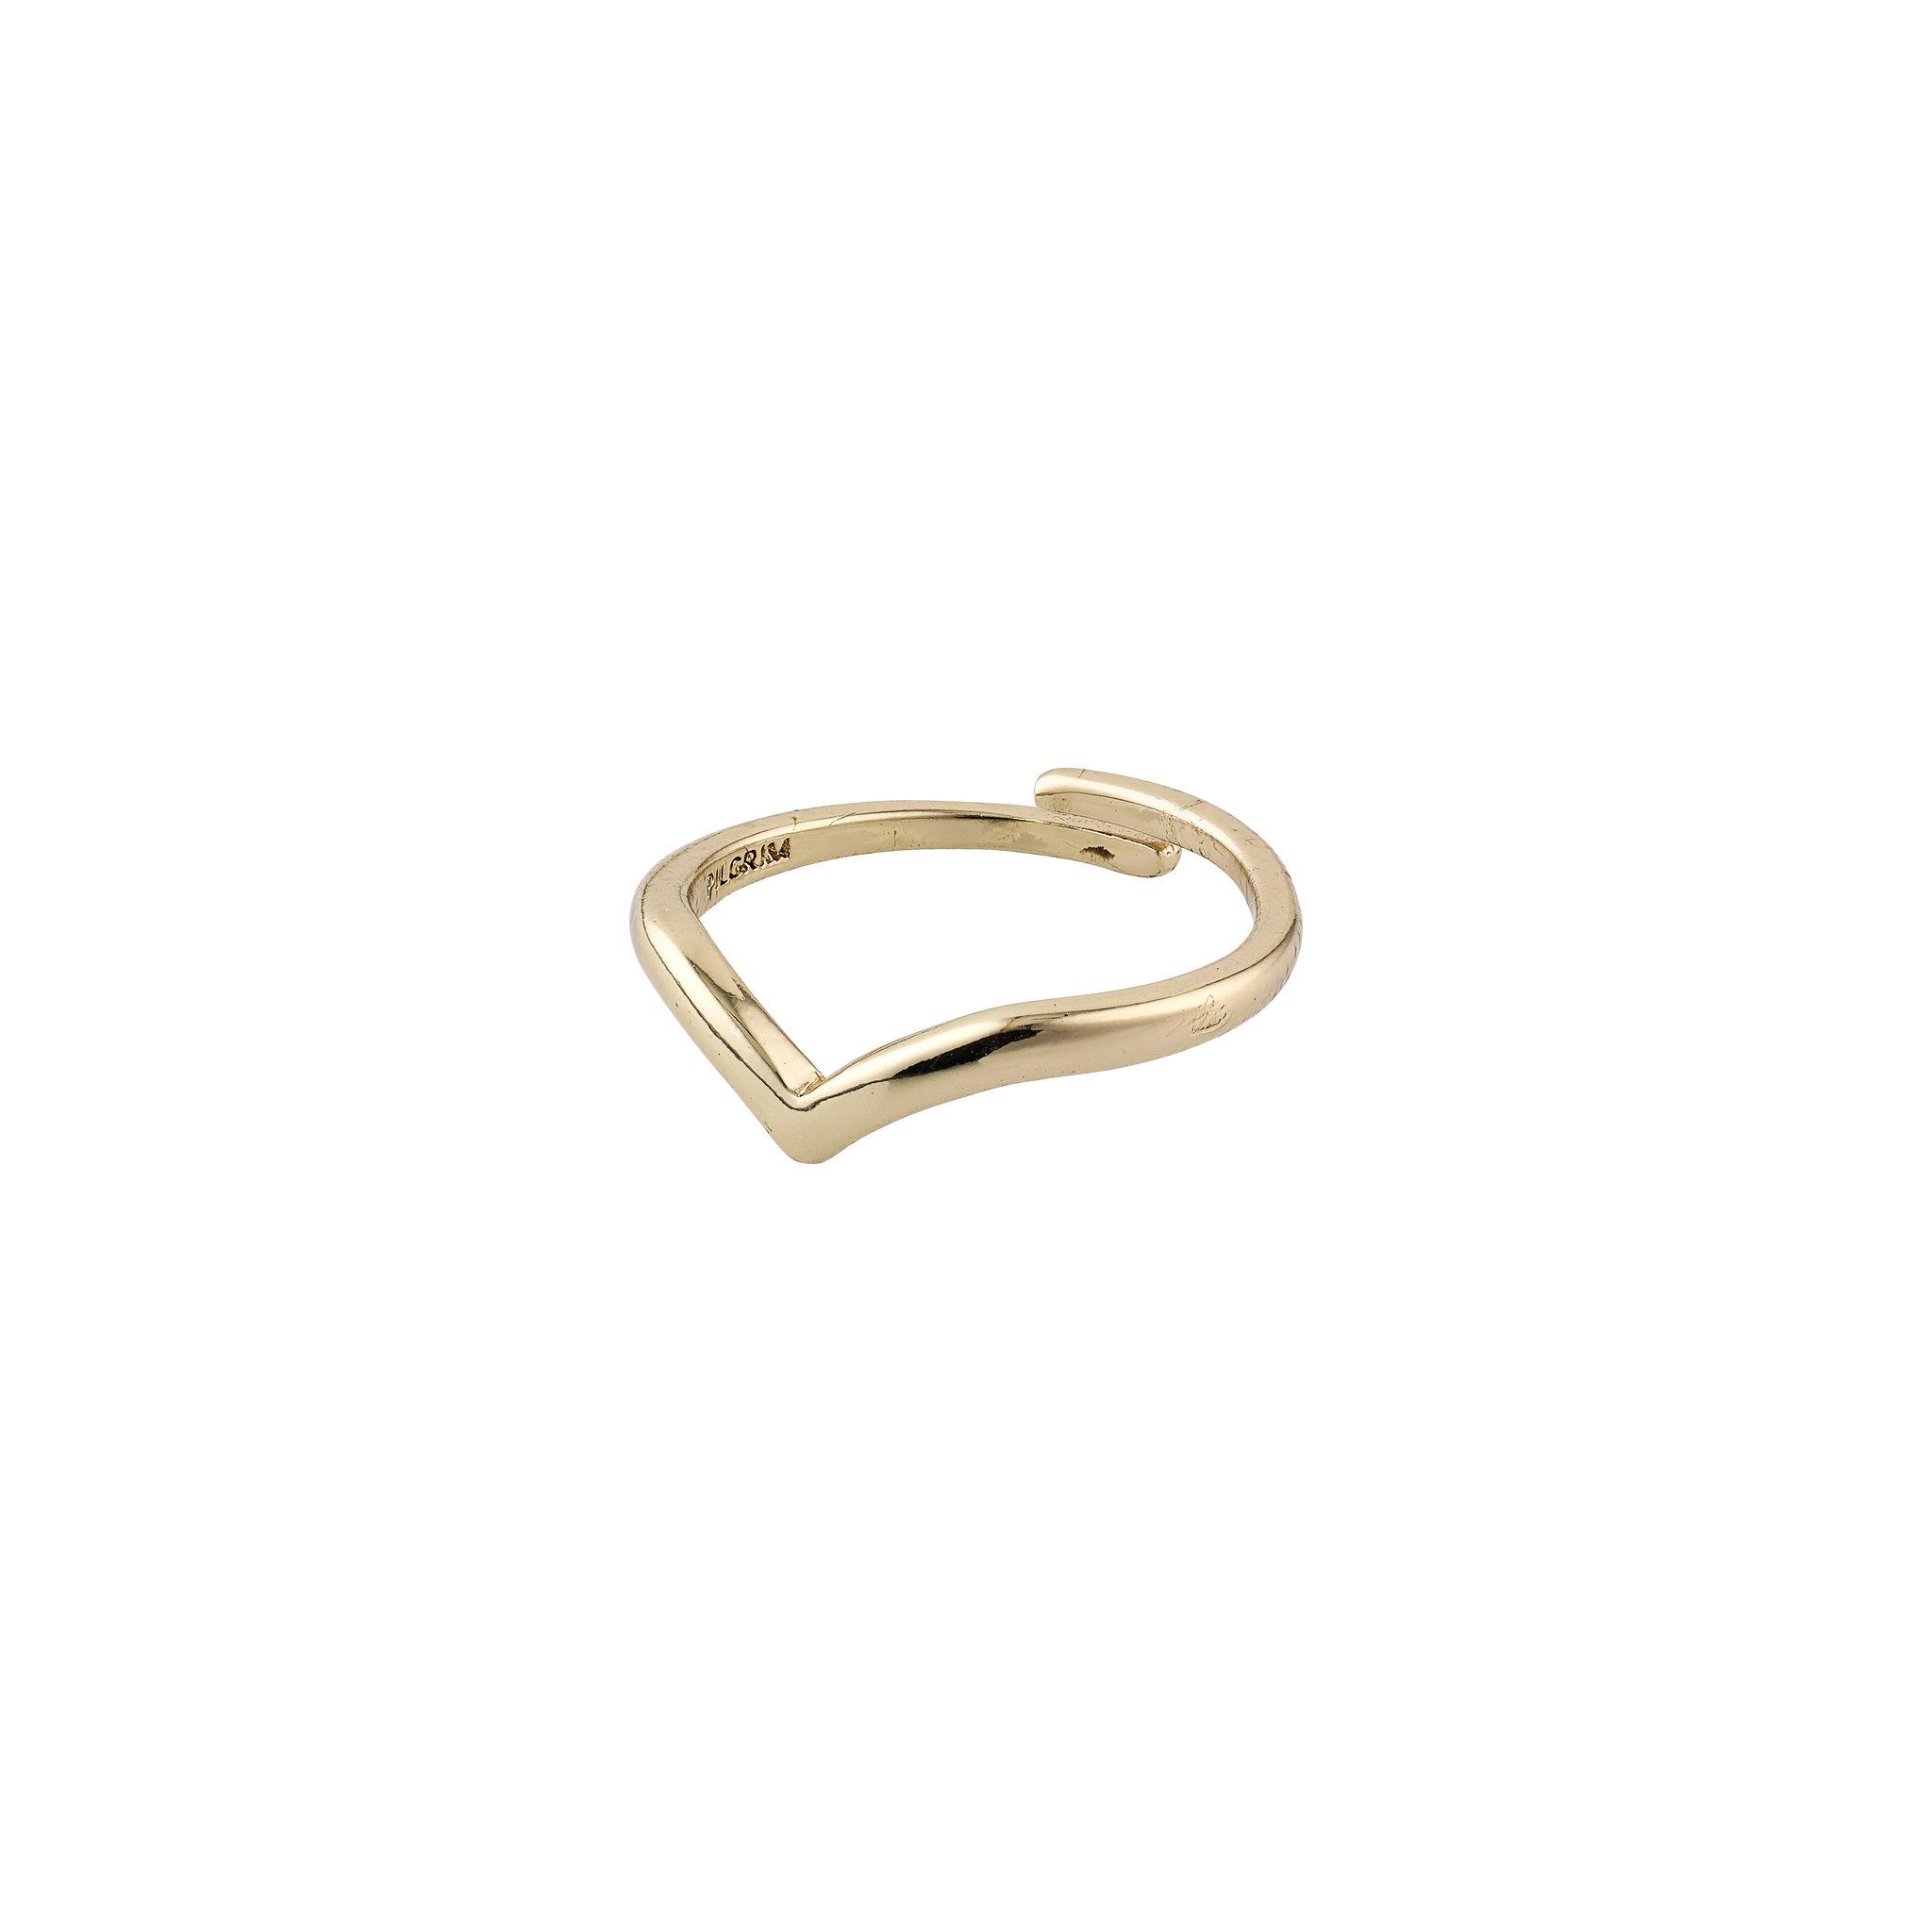 Pilgrim Lulu 1 ring, guld